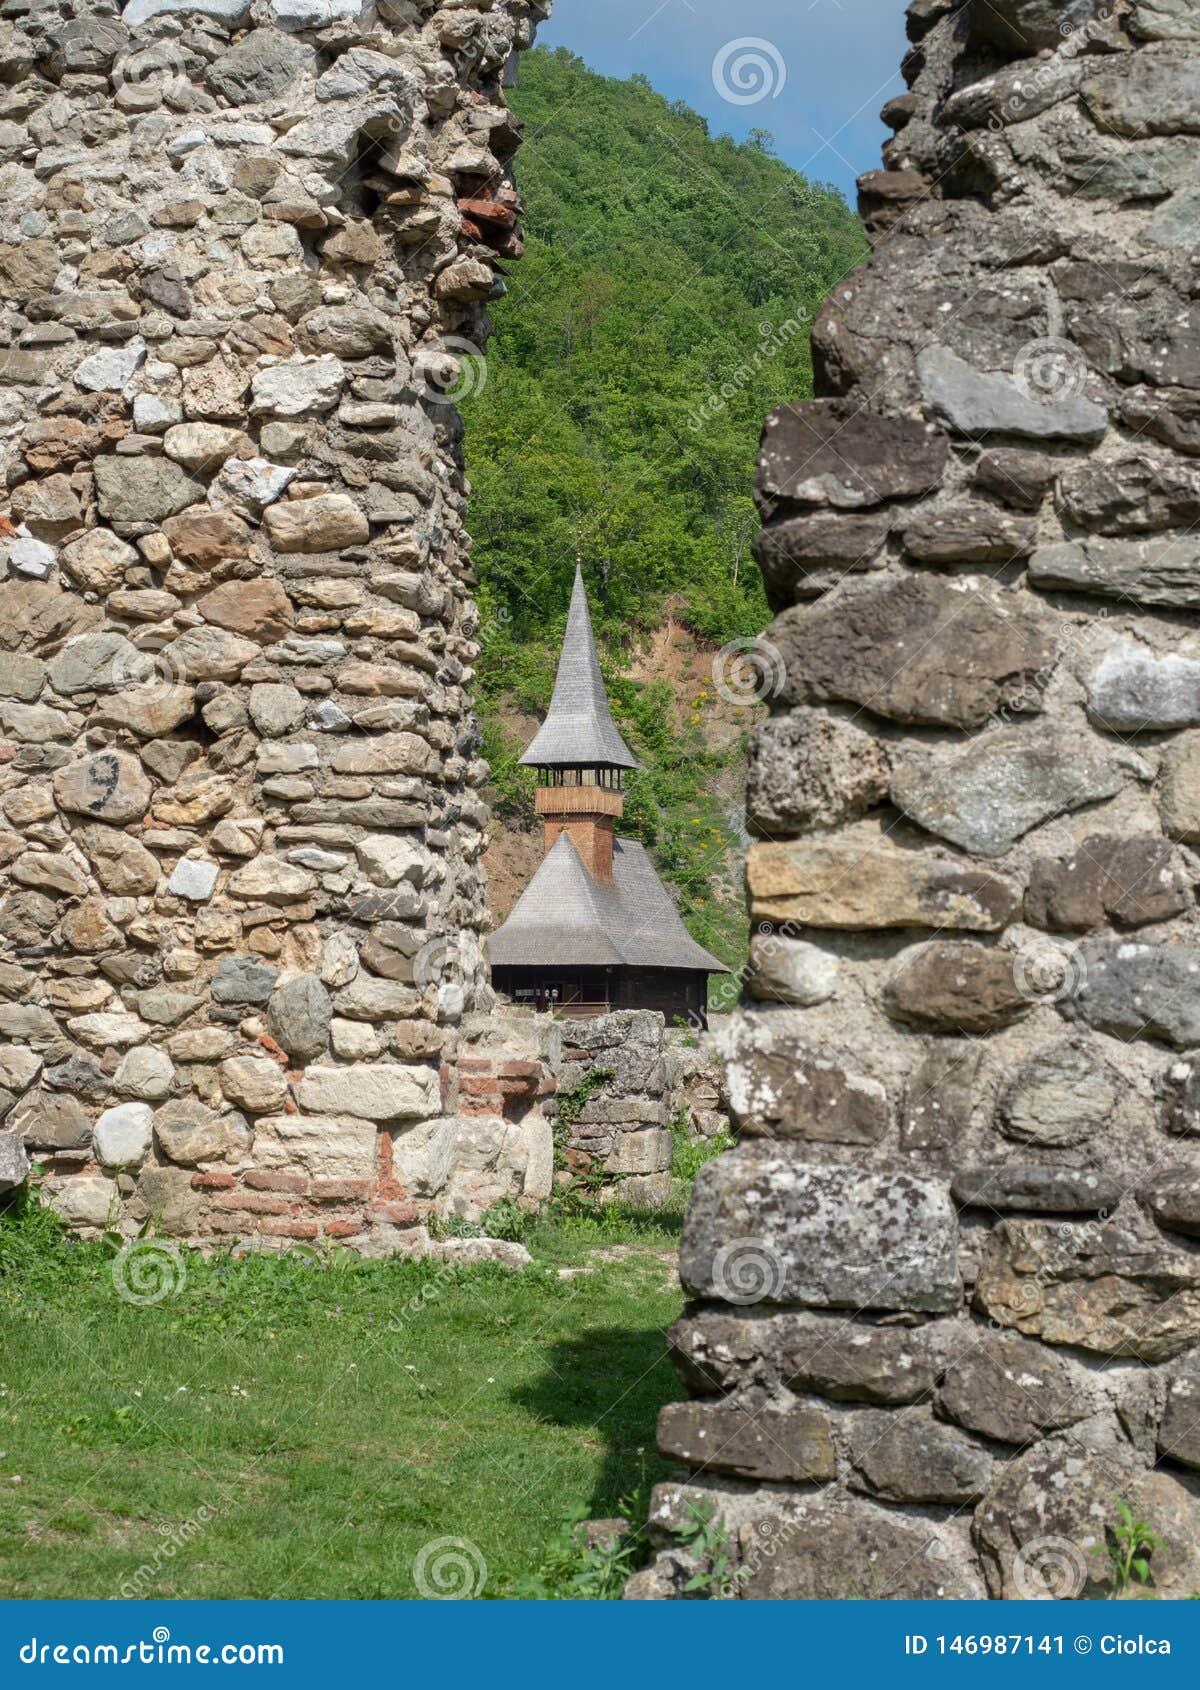 The old church at Vodita monastery, Romania